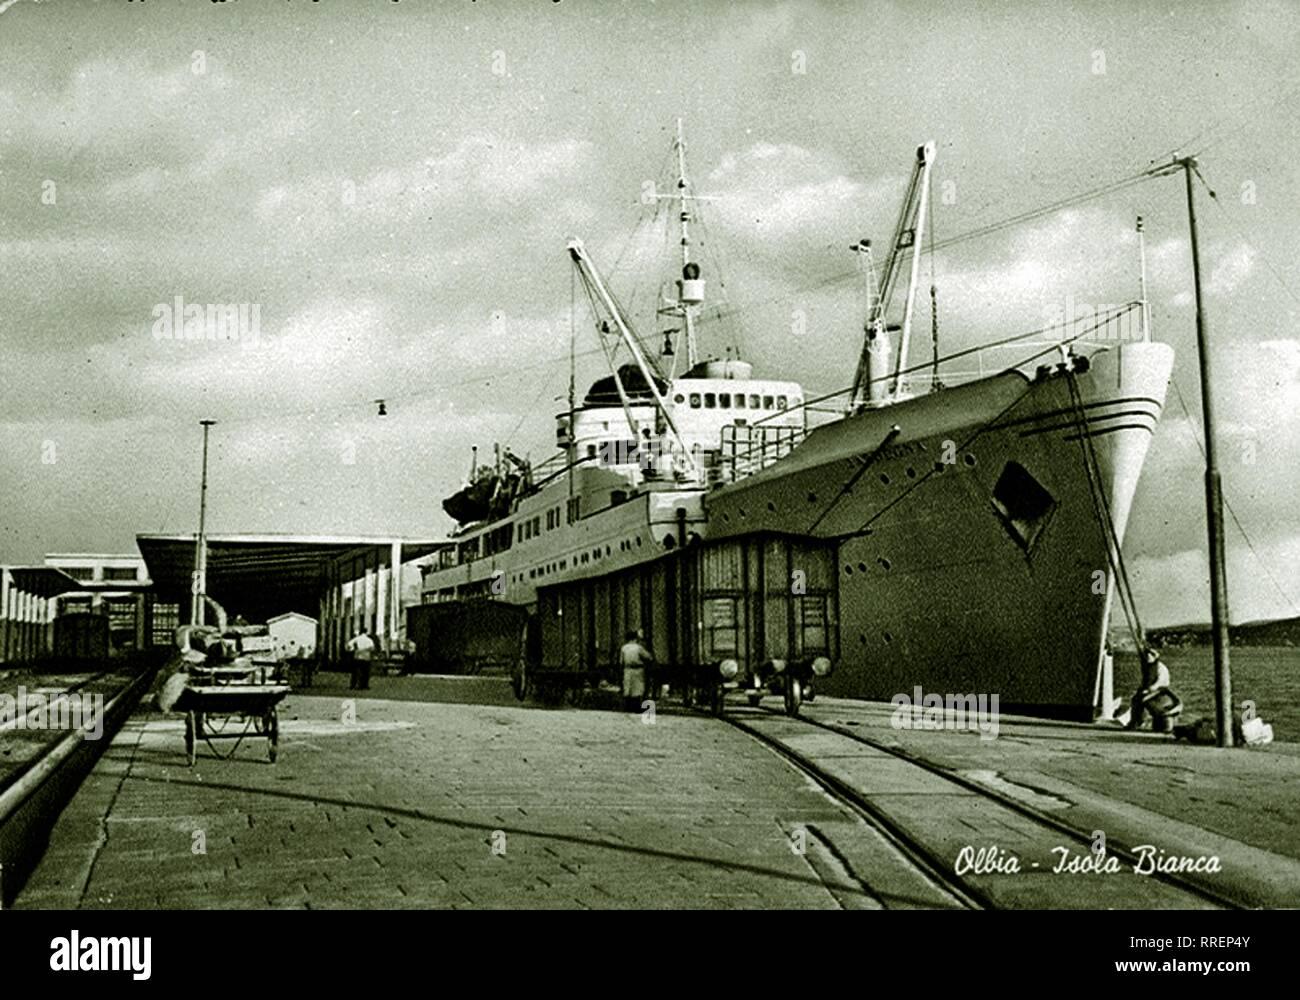 Historical postcard. Olbia, Sardinia, Italy. The Isola Bianca harbour 1960 asbut - Stock Image